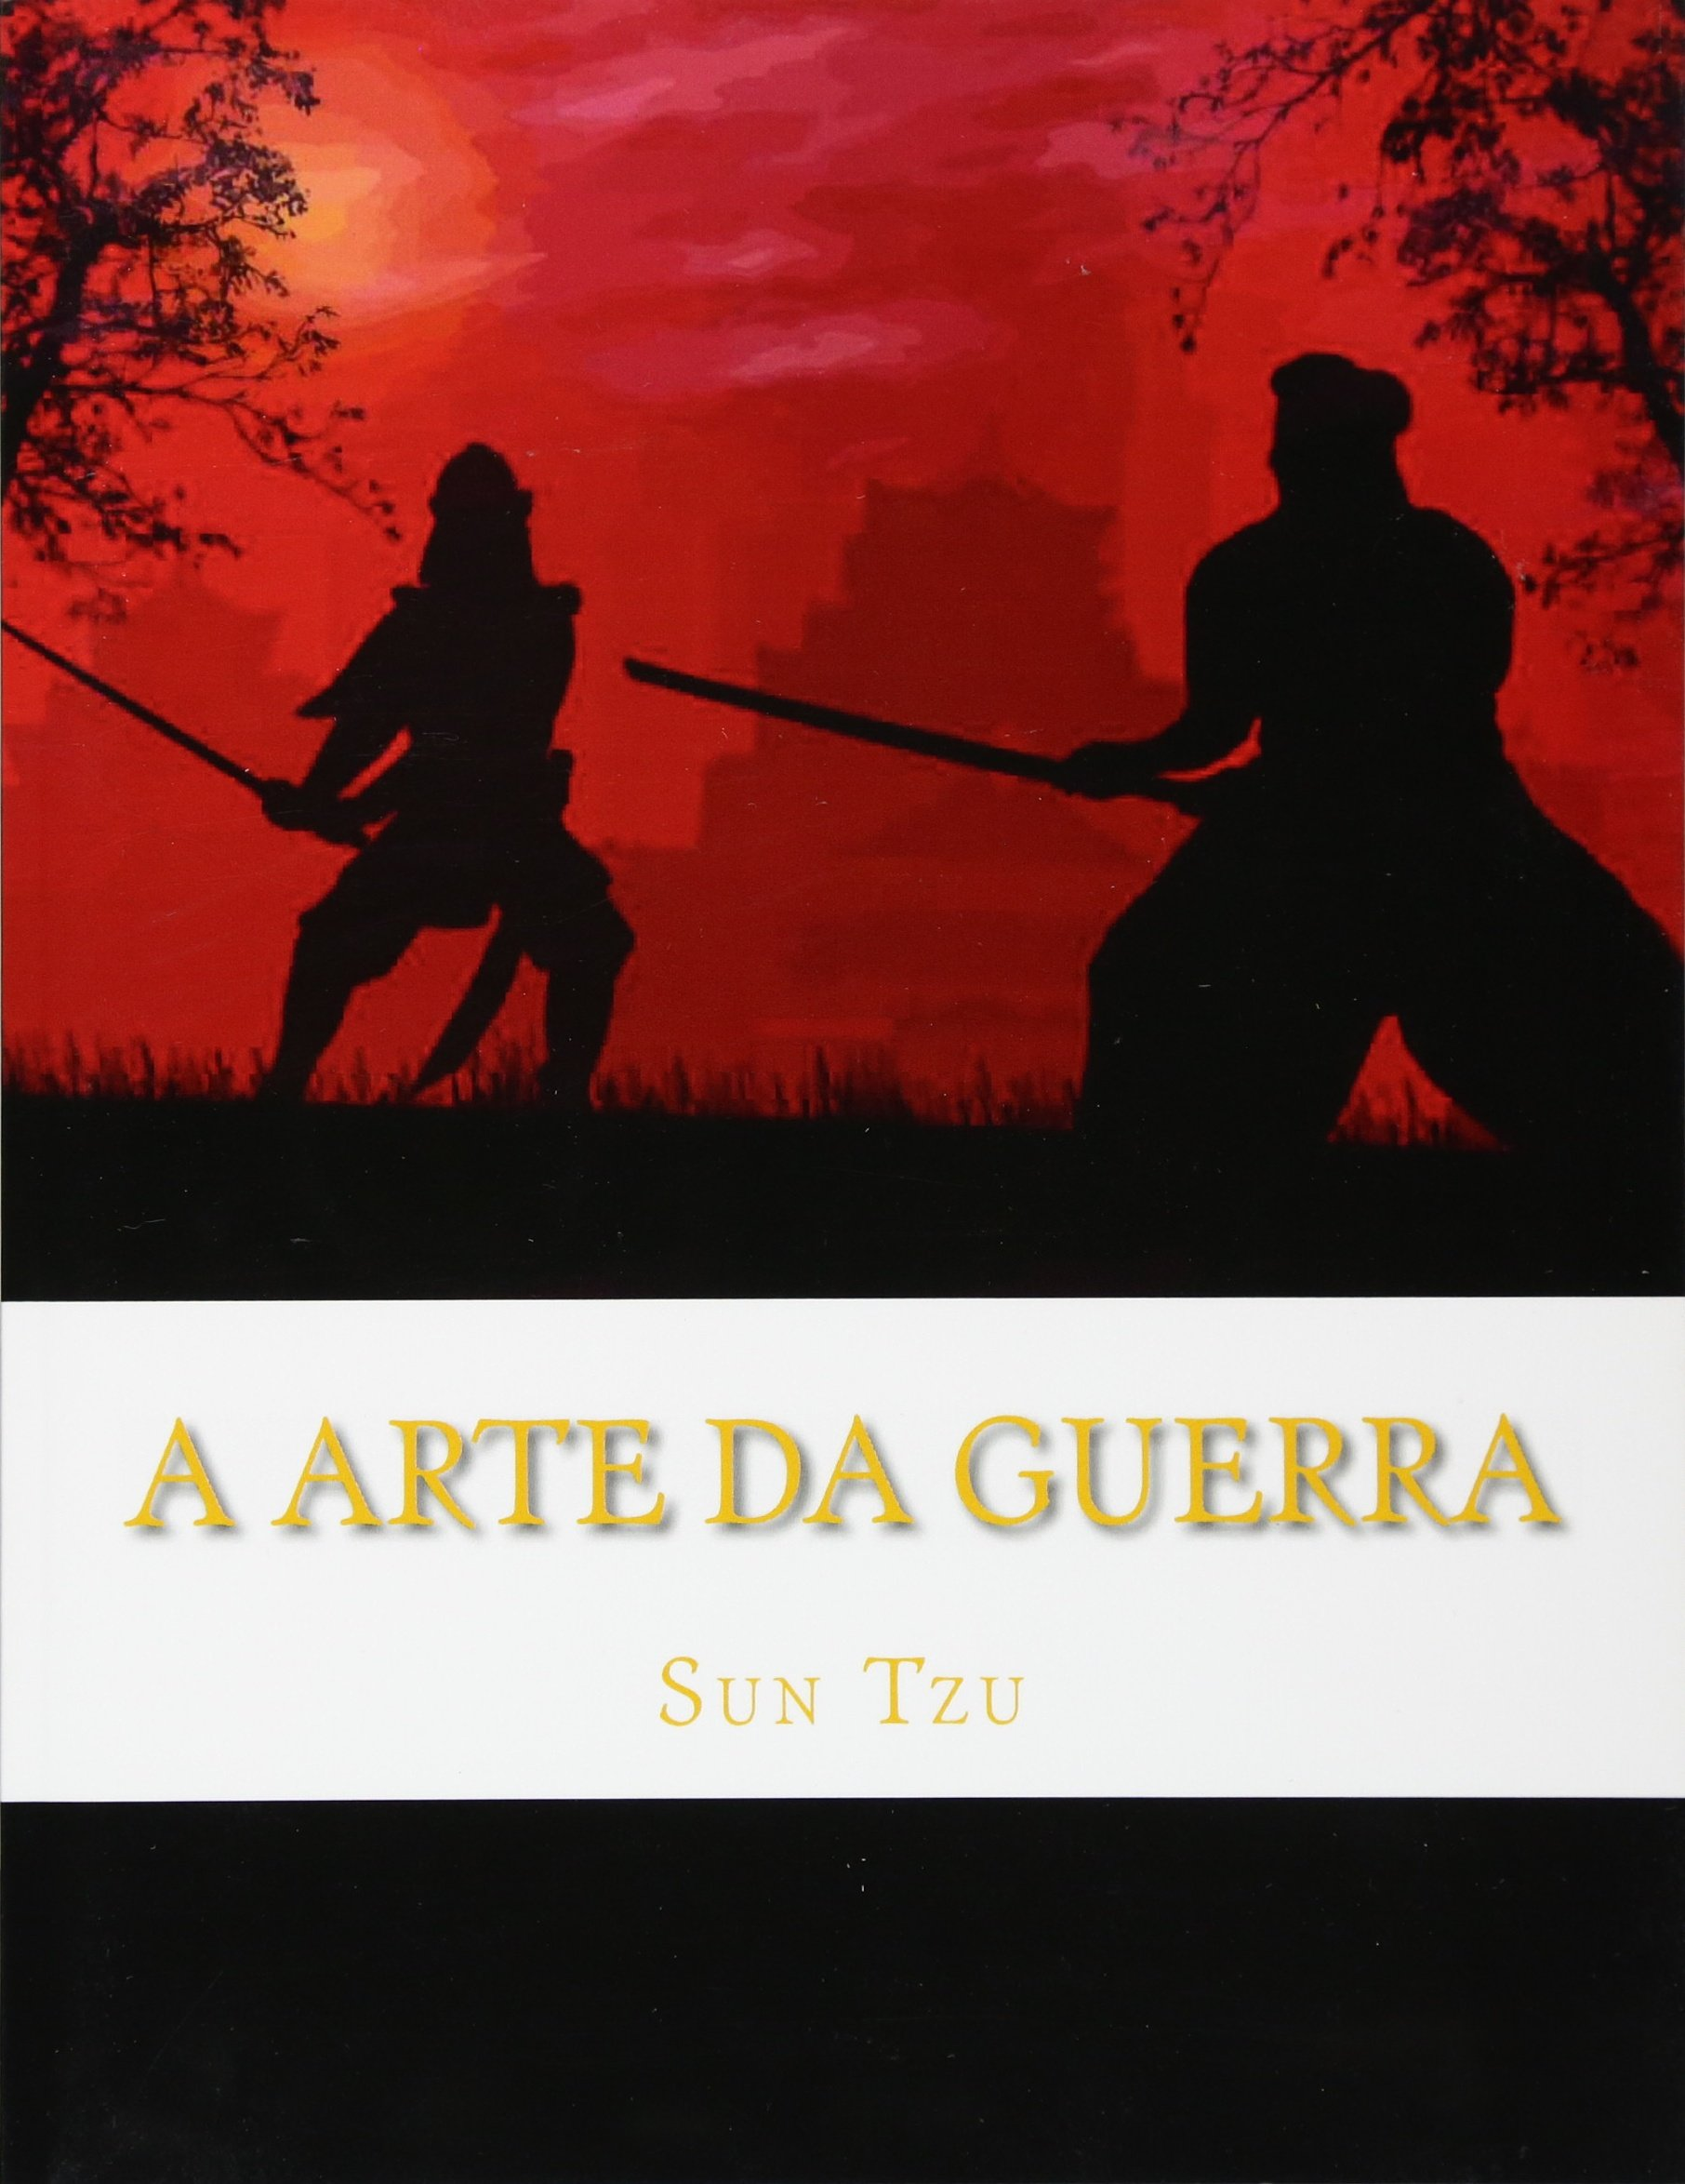 A Arte da Guerra: Os 13 Capítulos Completos (Portuguese Edition) pdf epub